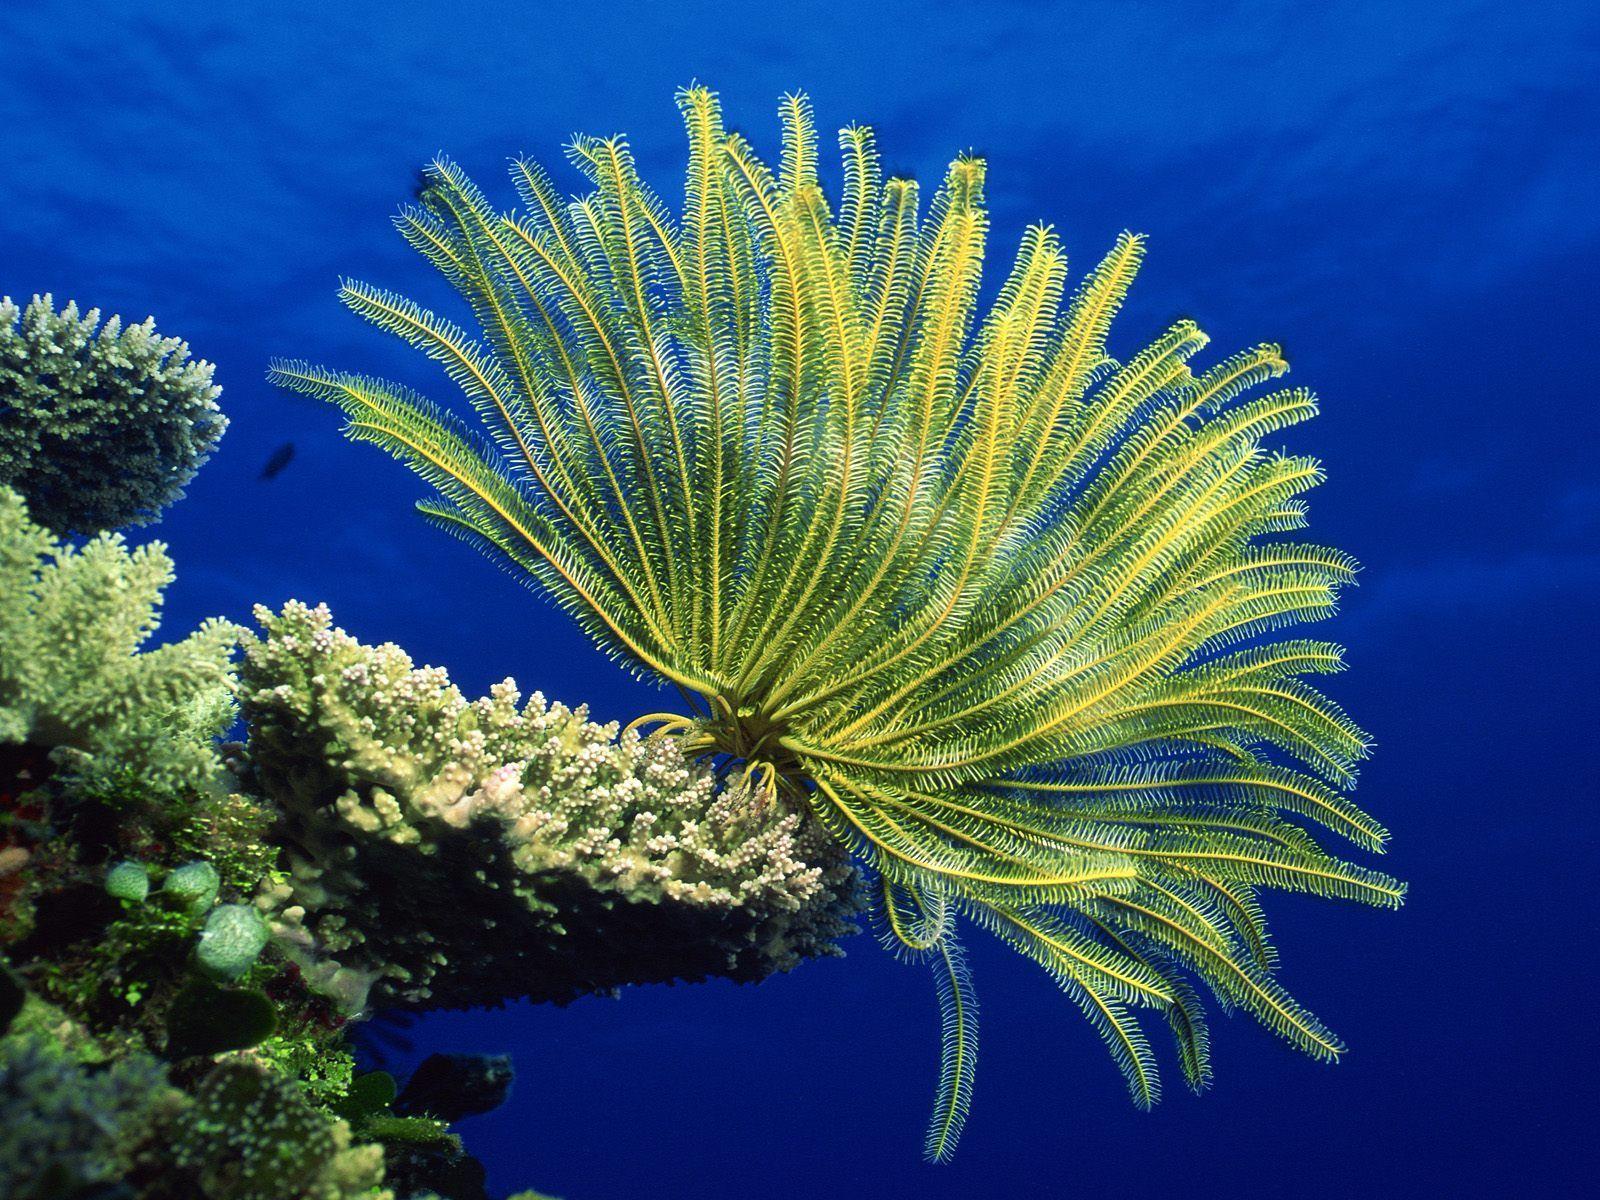 Pin By Cheryl Gubitosi On Beautiful Nature Underwater Images Sea Life Wallpaper Ocean Animals Ocean underwater life fish corals algae